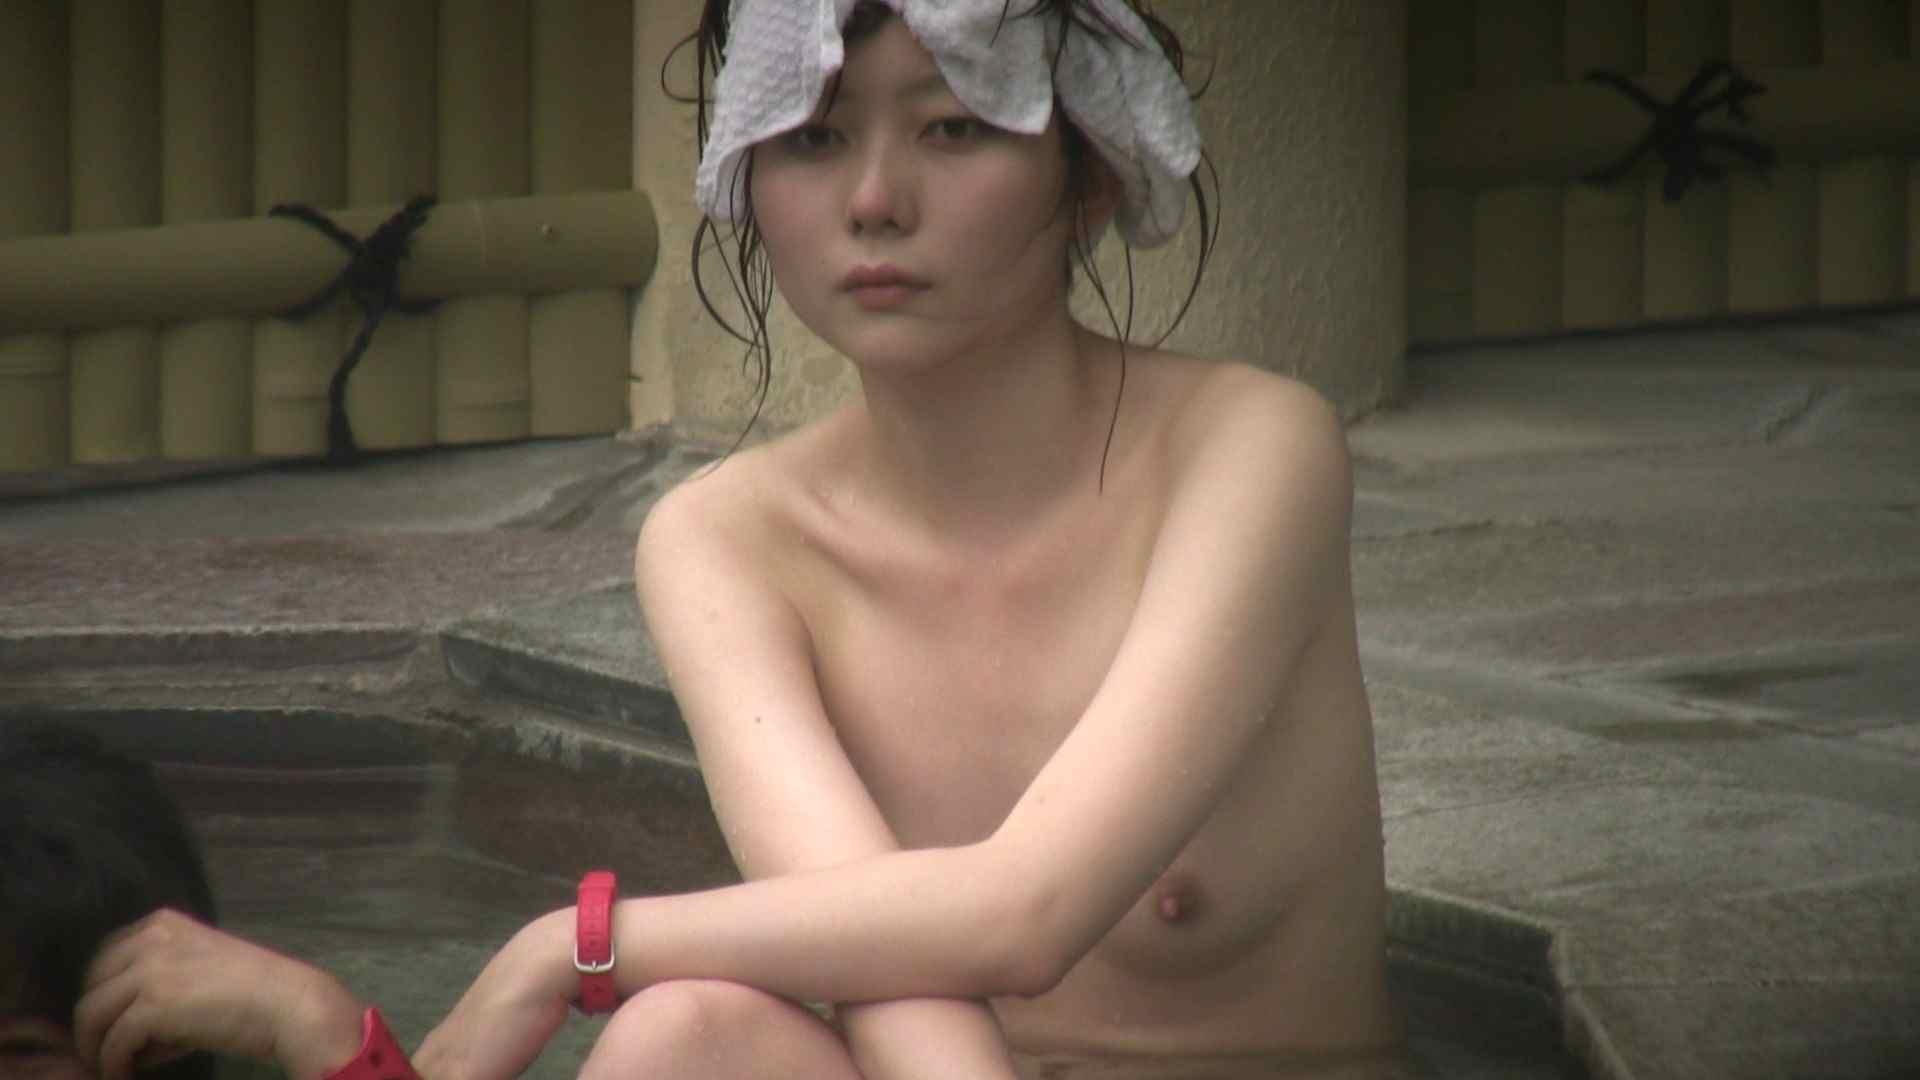 Aquaな露天風呂Vol.147 盗撮 | OLセックス  85画像 76